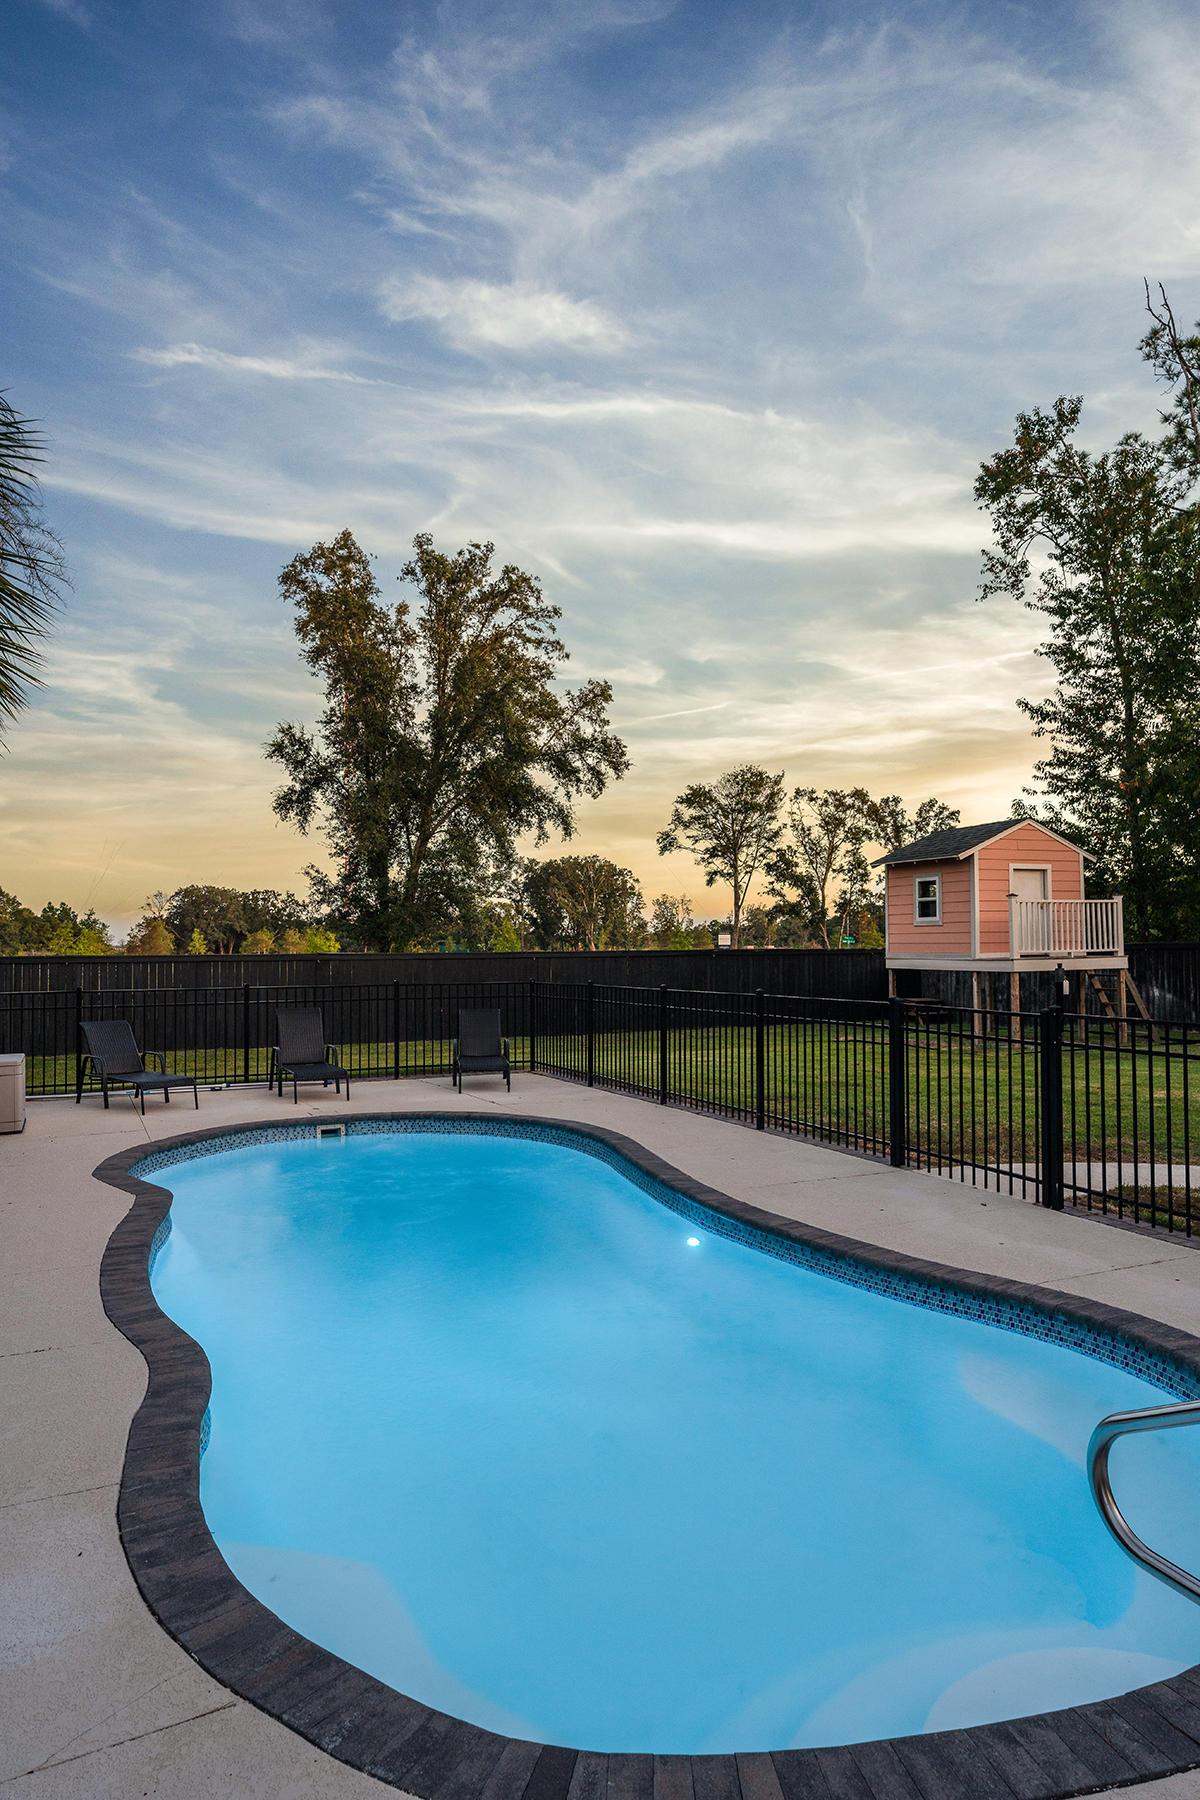 Scotts Creek Homes For Sale - 1389 Scotts Creek, Mount Pleasant, SC - 4